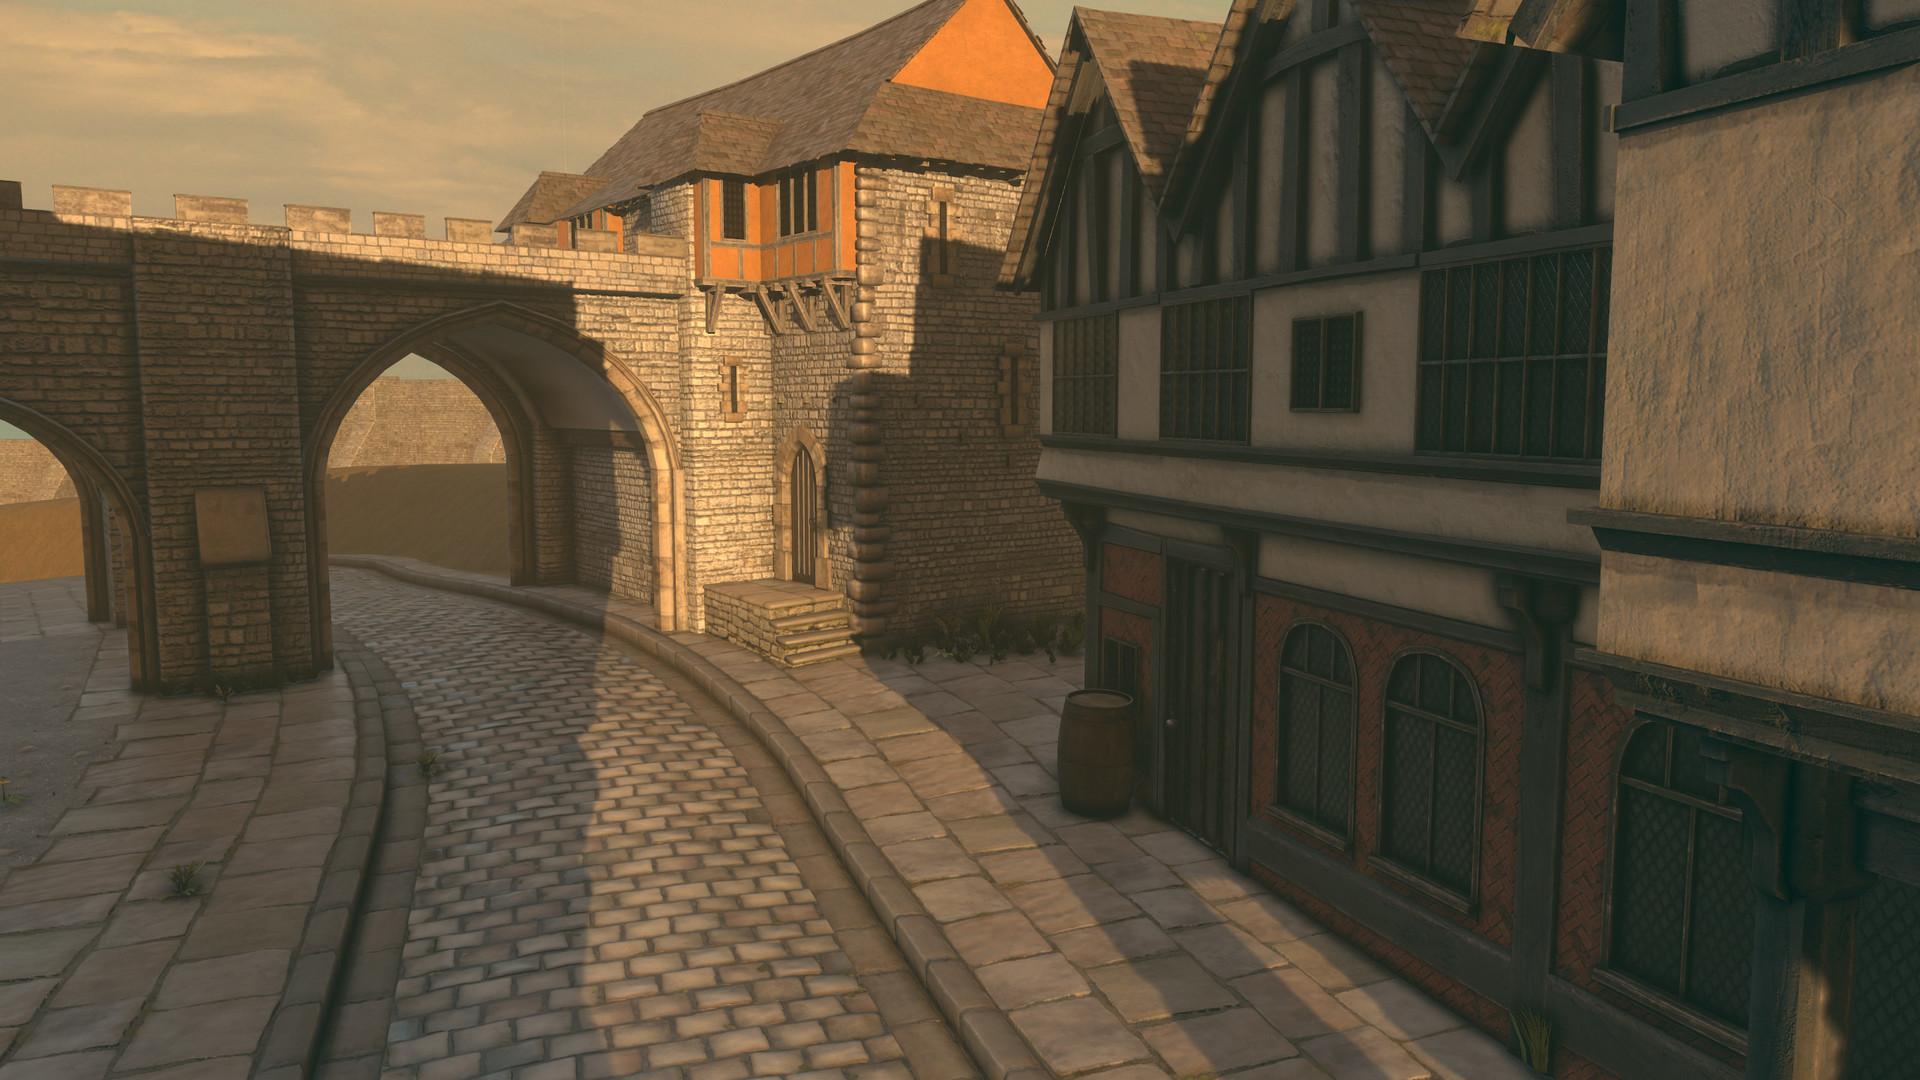 Alex voysey tudorstreet house and gatehouse